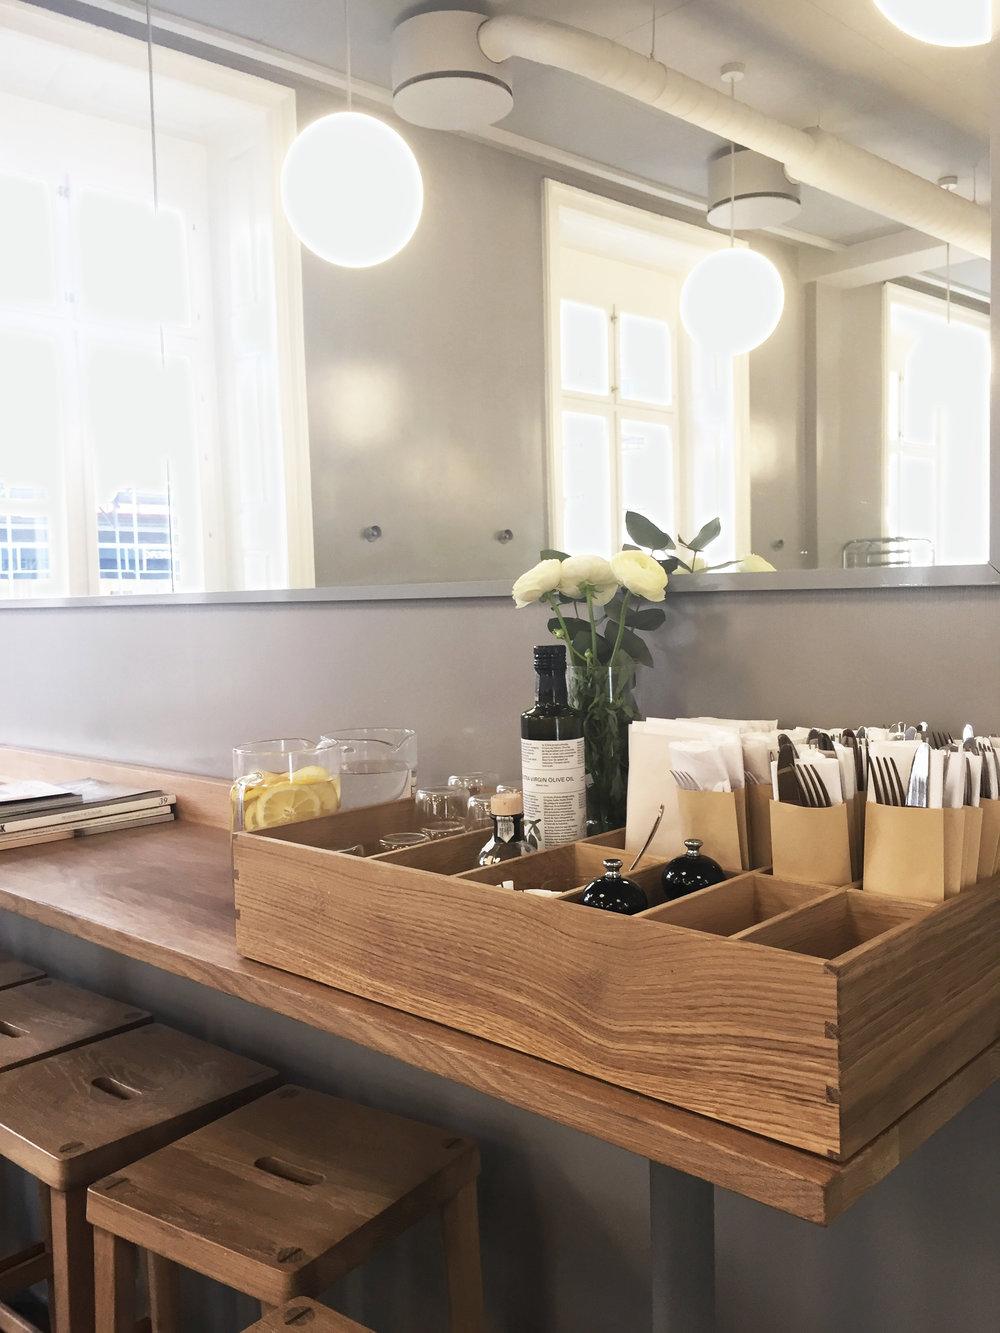 StudioGabrielle_Guide_Copenhagen_StylistEye_ArketCafe